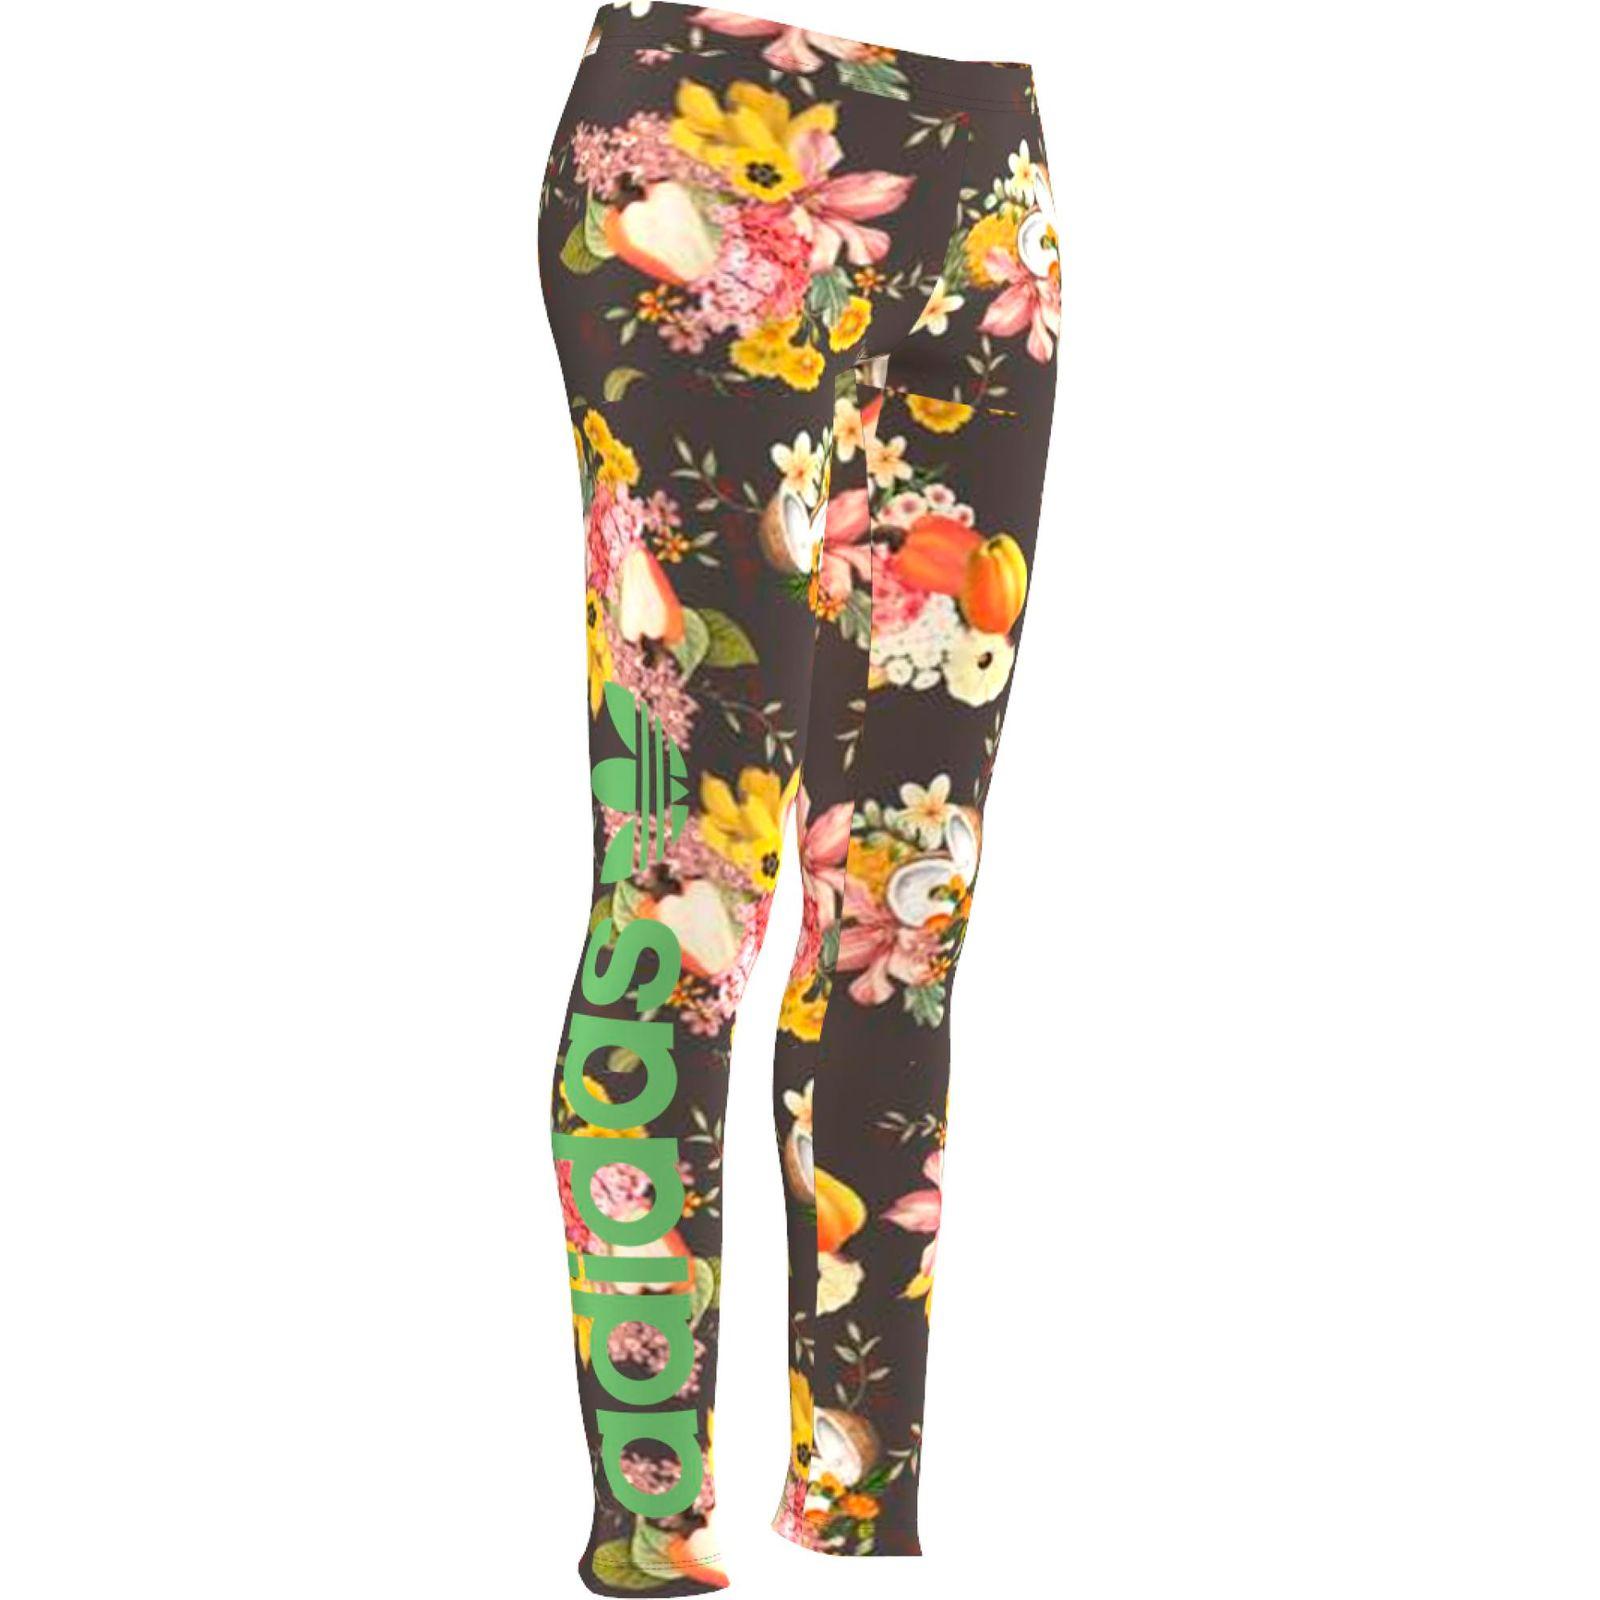 12dadaf39f593 Details about Adidas Originals the Farm Jardim Leggings Sport & Leisure  Trousers Floral